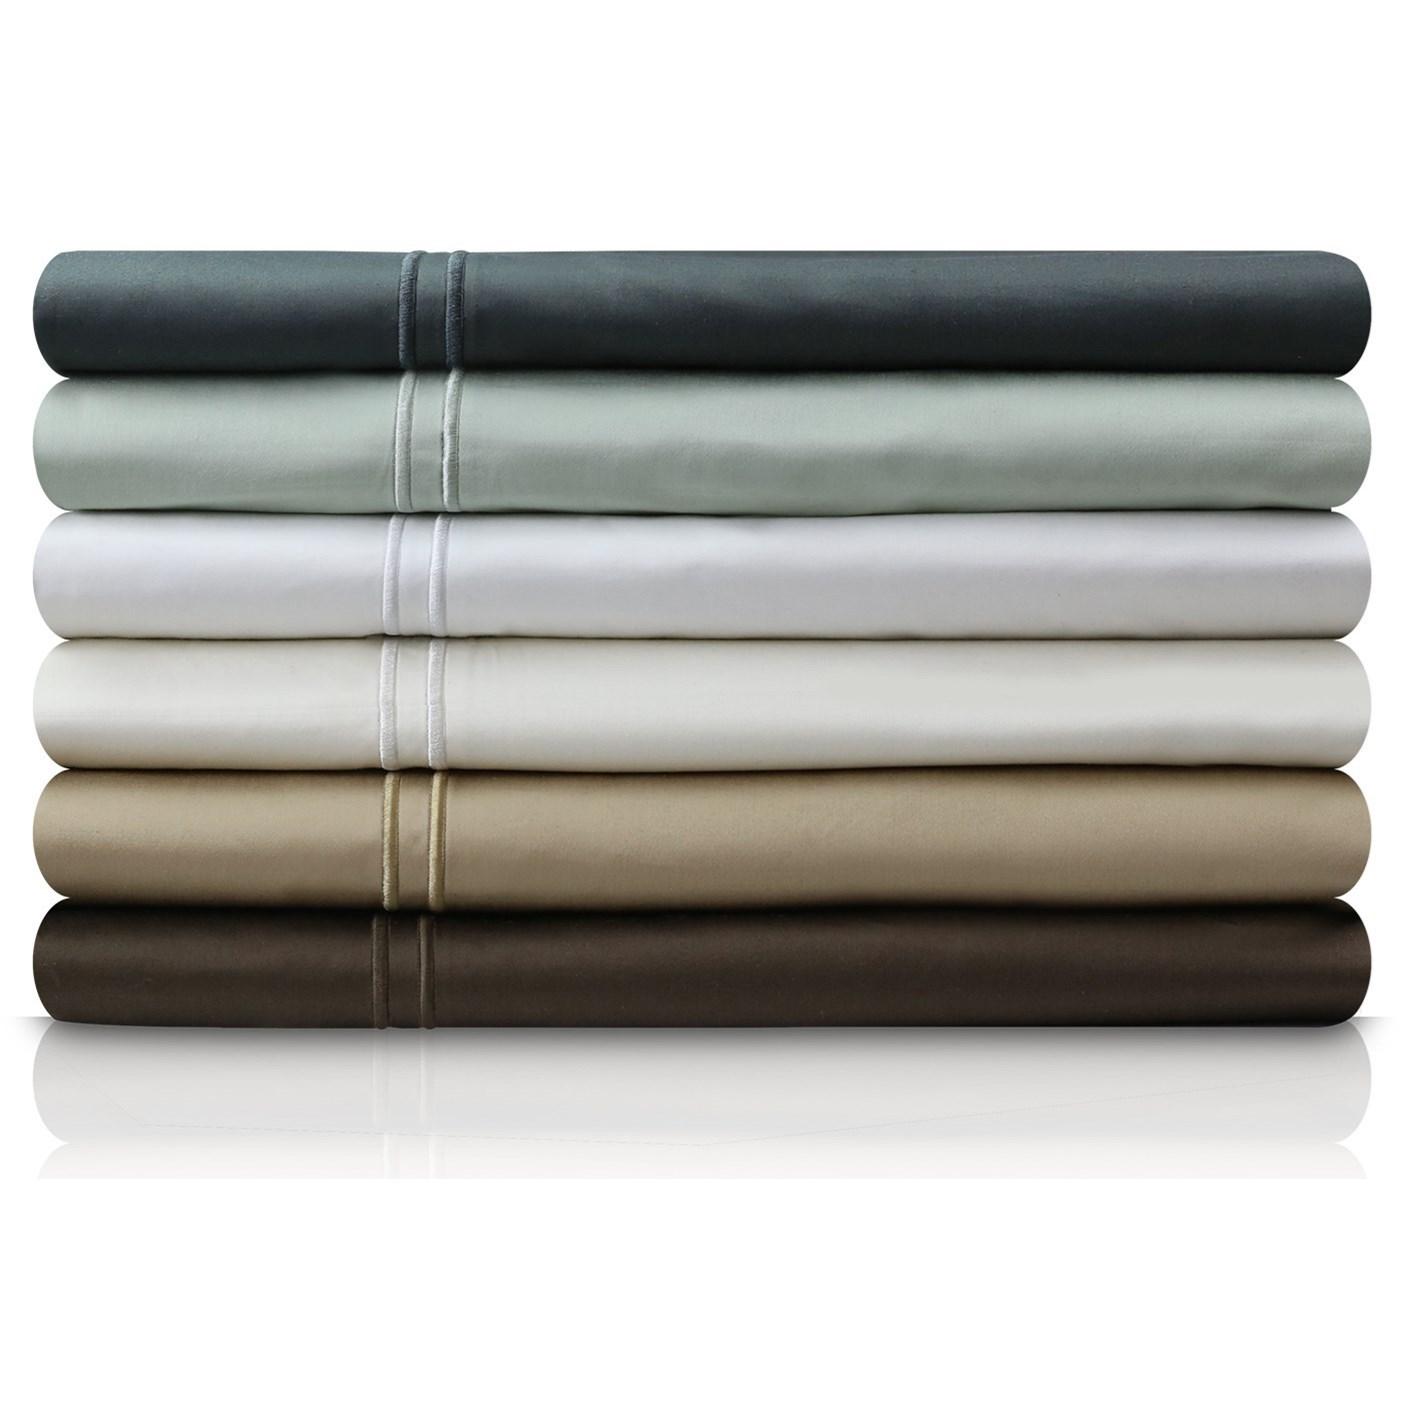 Malouf Egyptian Cotton Split Cal King 600 TC Egyptian Cotton Sheet  - Item Number: MA06SCCHSS